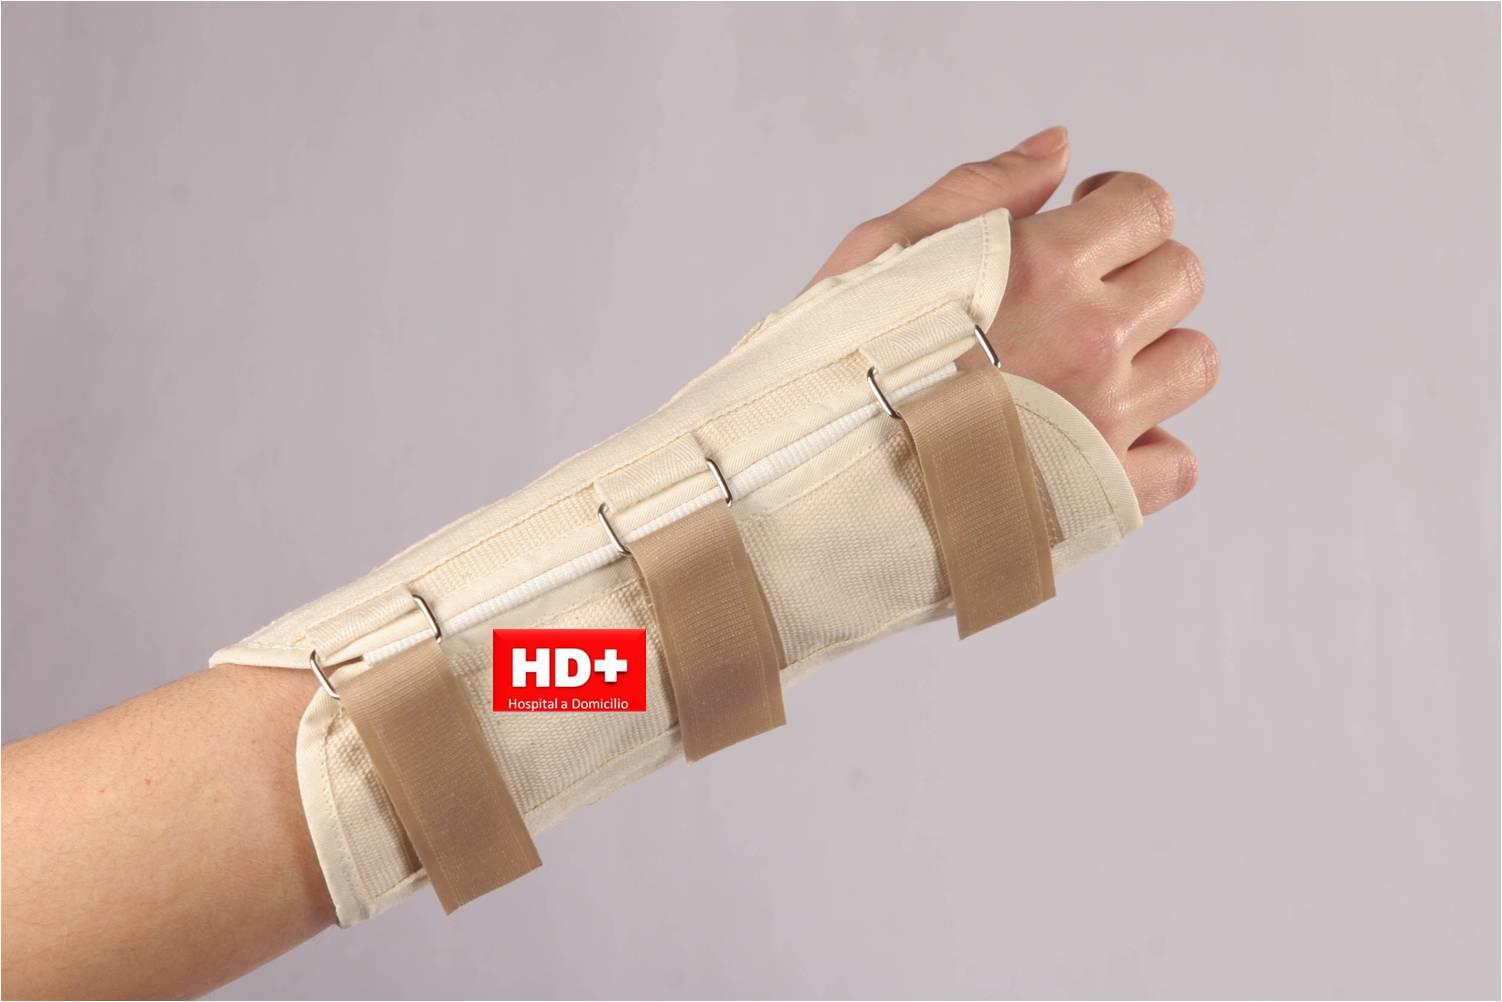 Hospital a Domicilio HD+ 2a62adcf1810